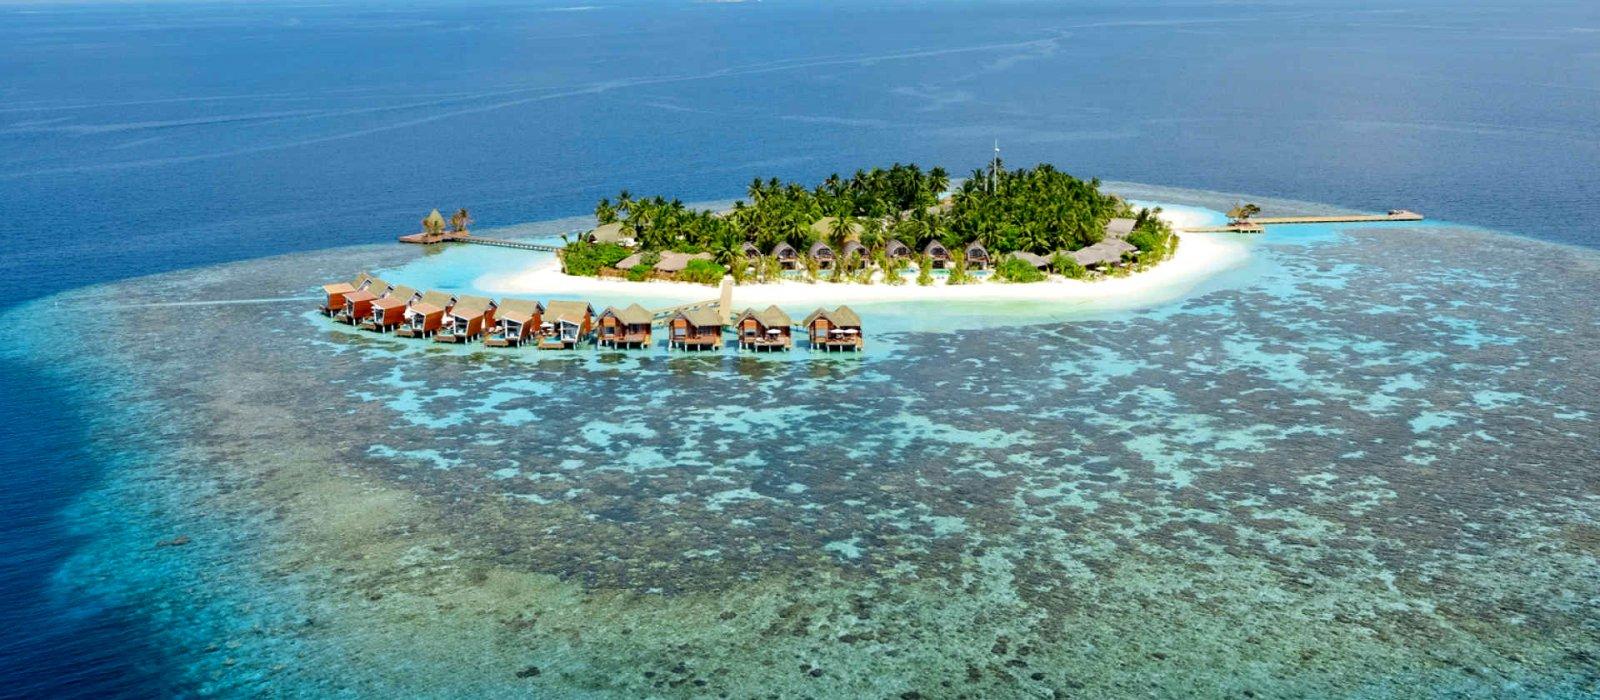 Maldives Tour Cost From Mumbai